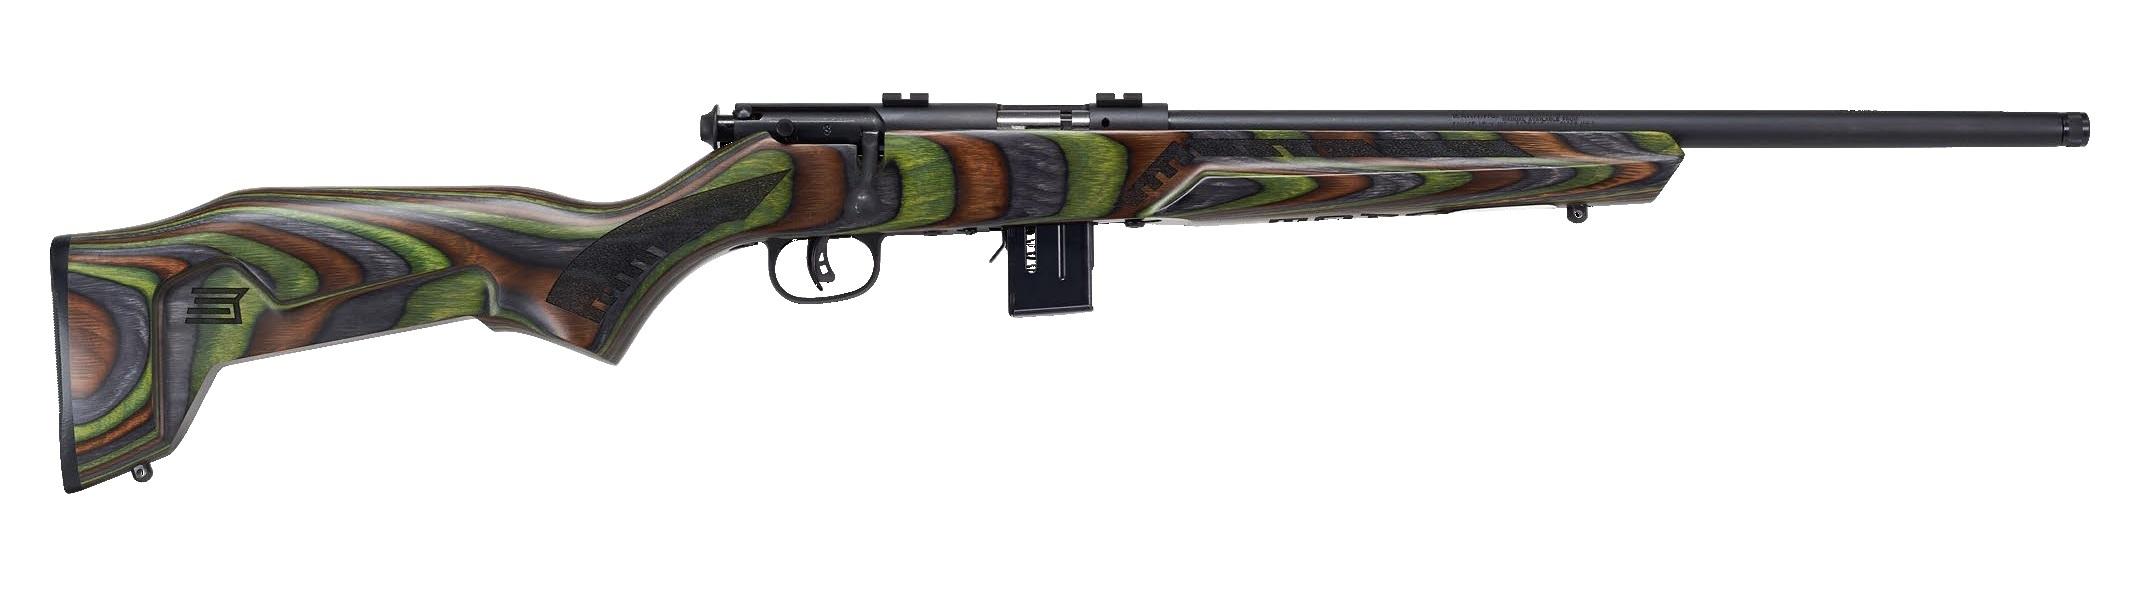 Savage Arms 93 Minimalist 17 HMR